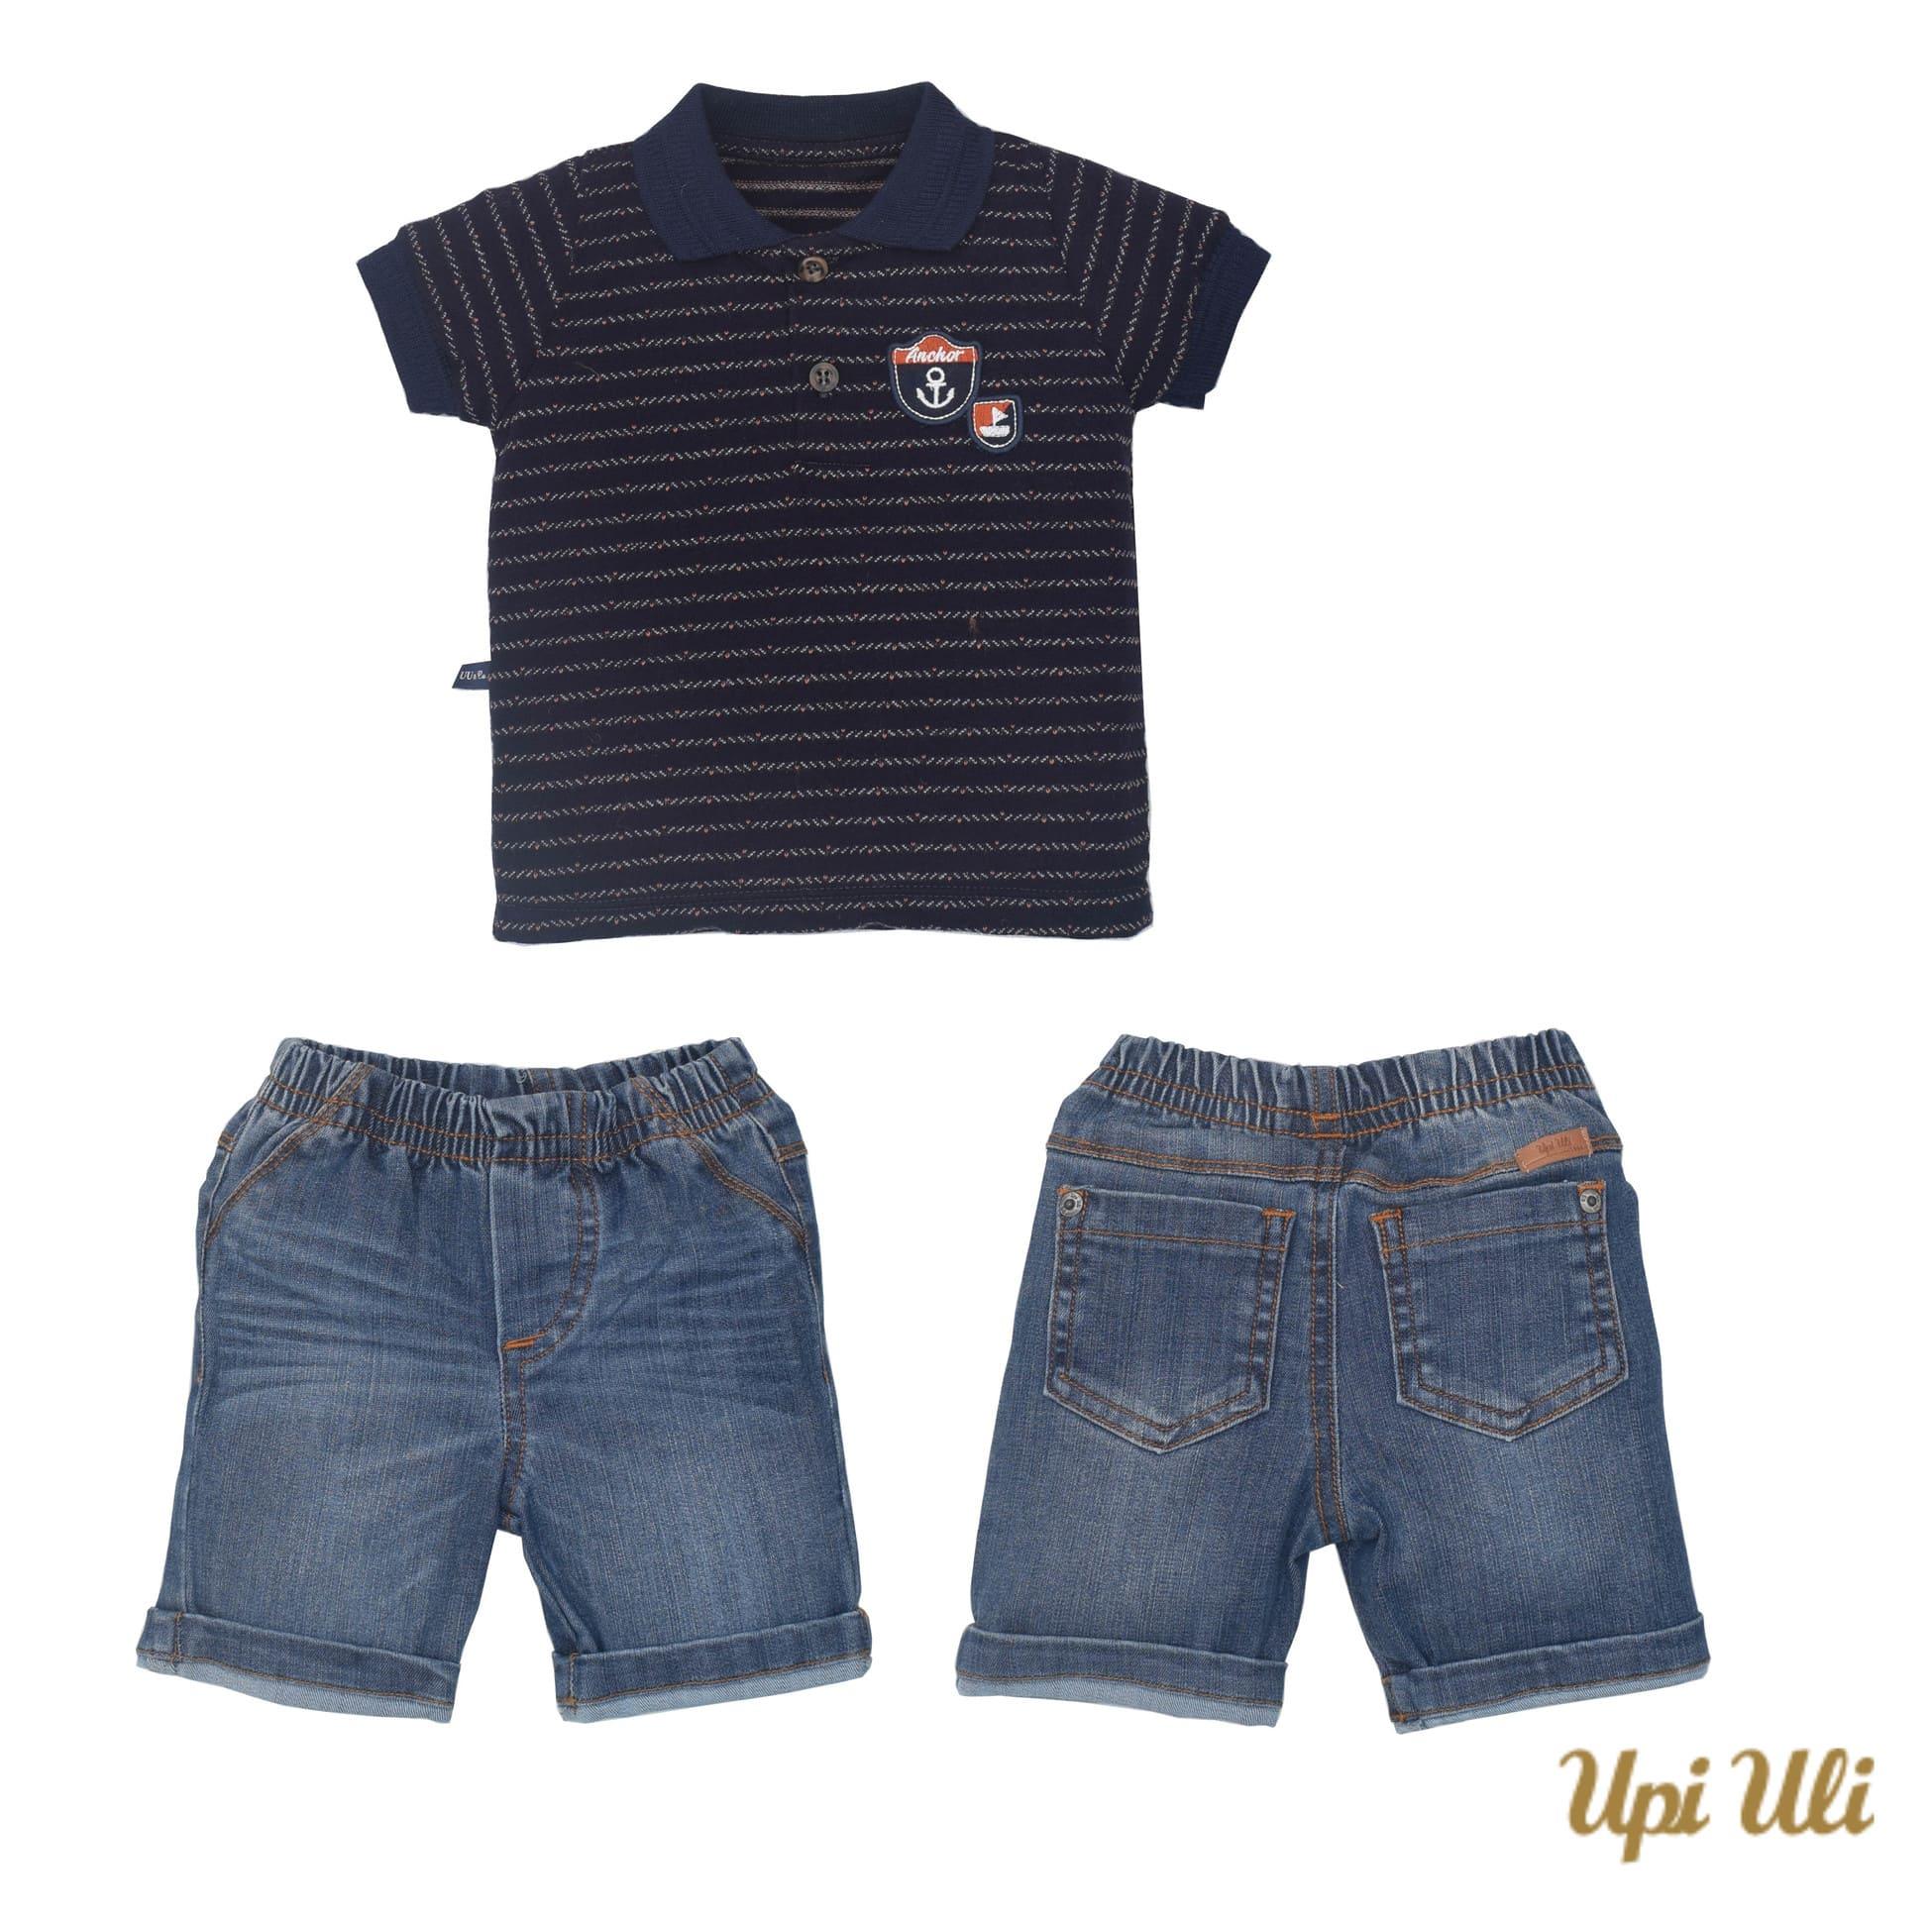 Conj. Polo Malha/Jeans José